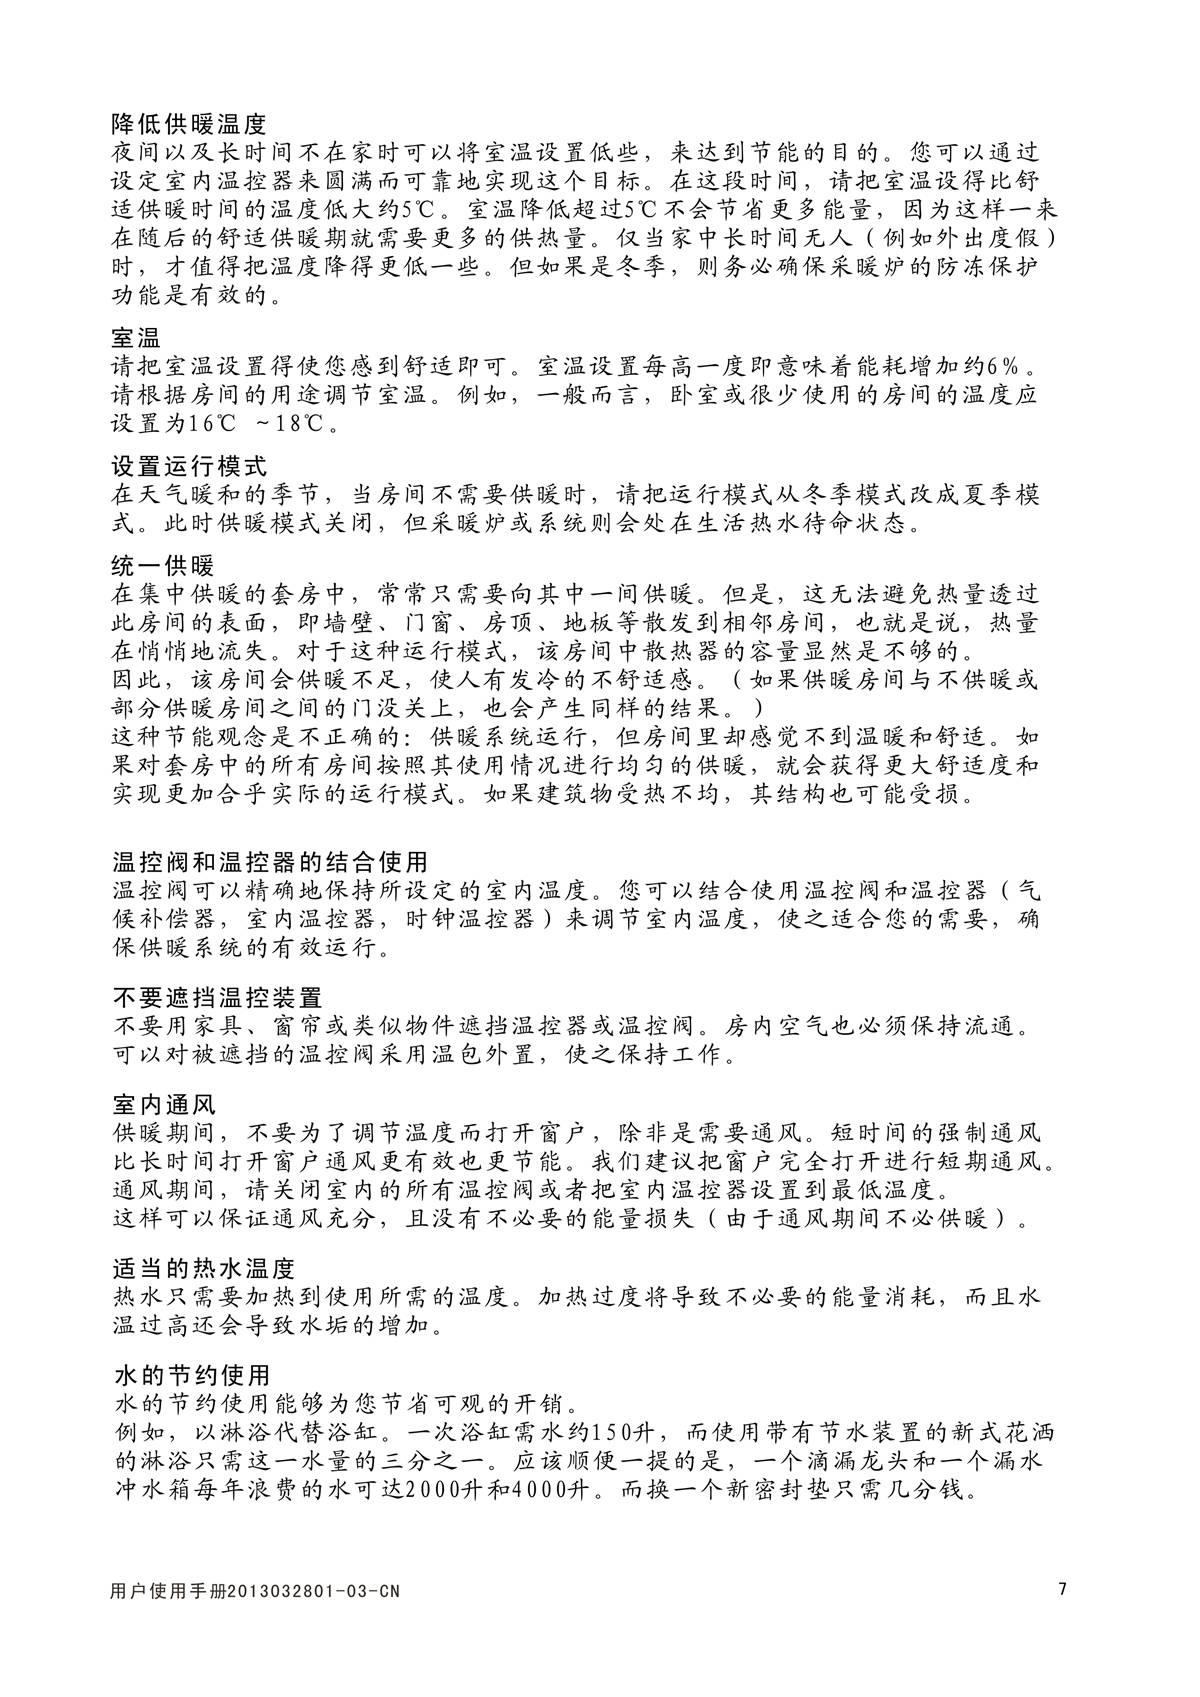 ES16B系列-用户使用手册-8_02.jpg